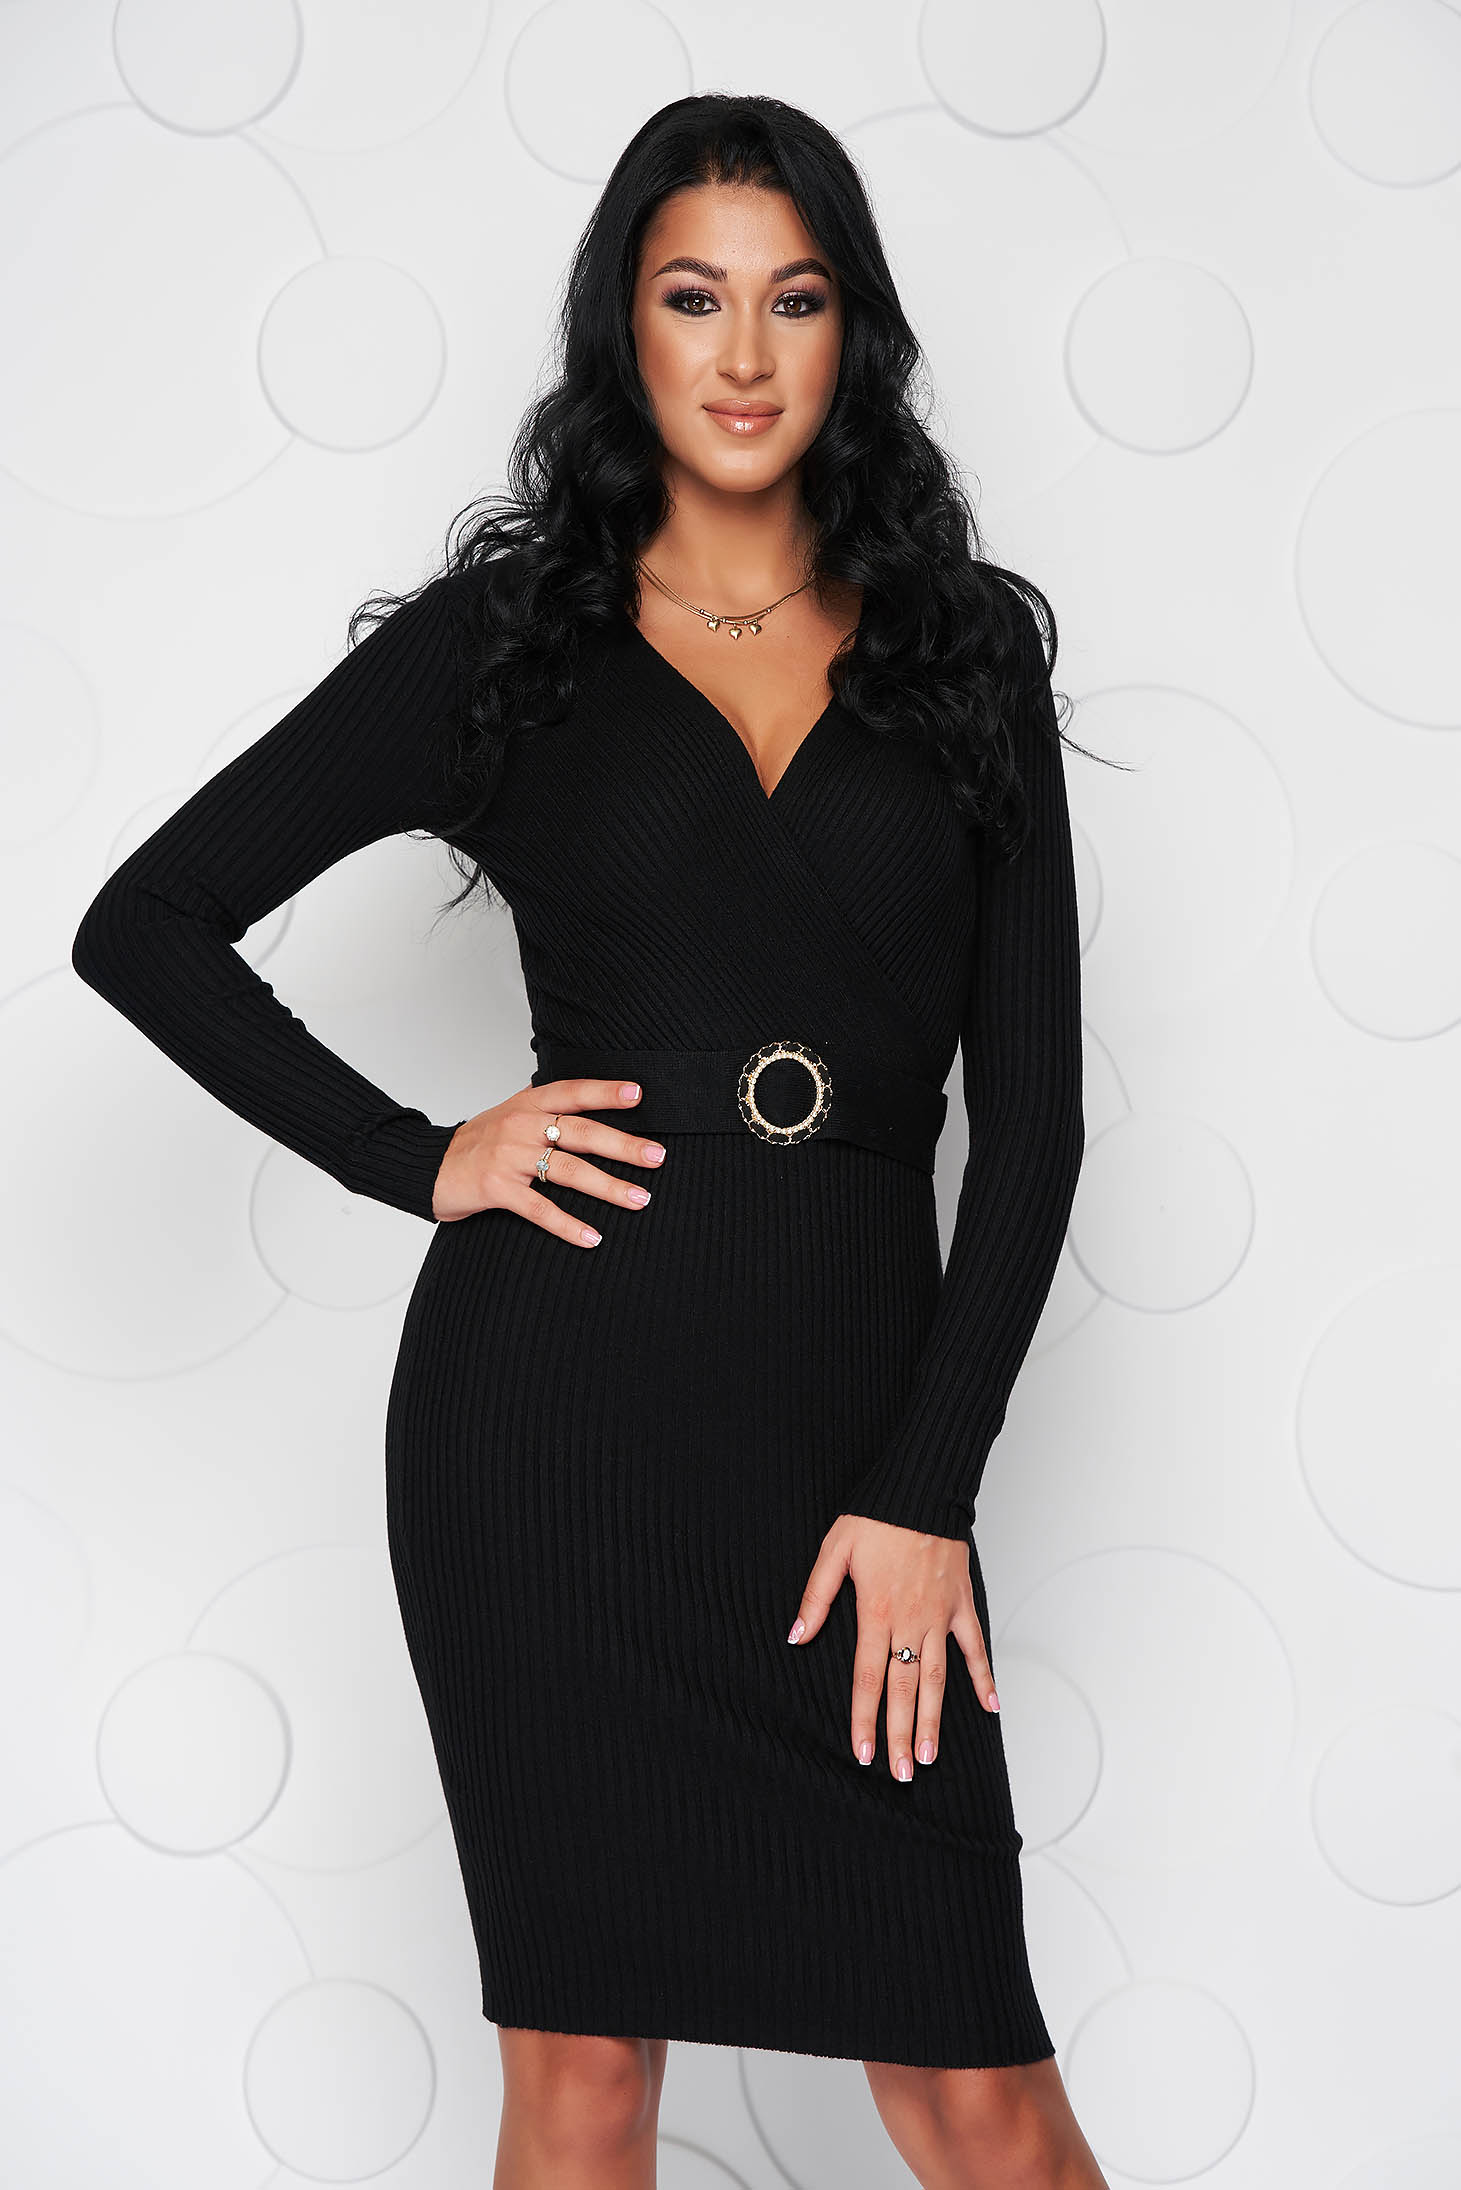 Rochie SunShine neagra midi din material tricotat elastic si reiat accesorizata cu o catarama